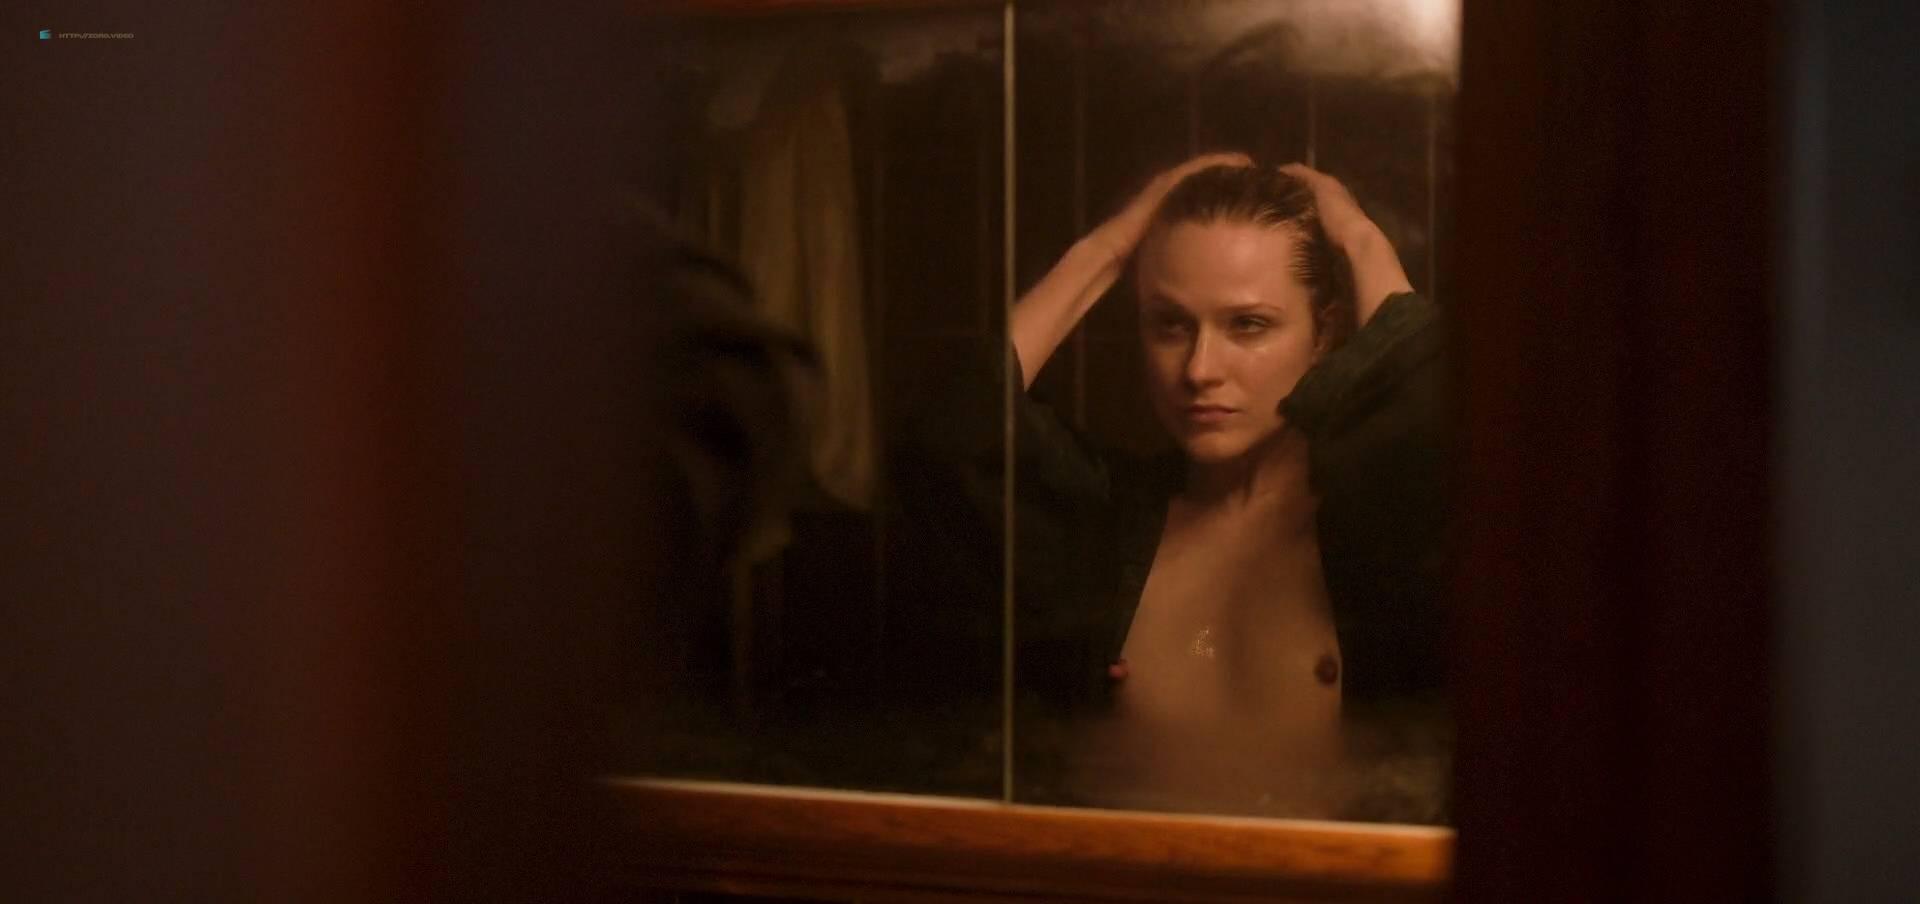 Evan-Rachel-Wood-nude-and-rough-sex-and-Julia-Sarah-Stone-hot-in-scenes-Allure-2017-HD-1080p-Web-008.jpg